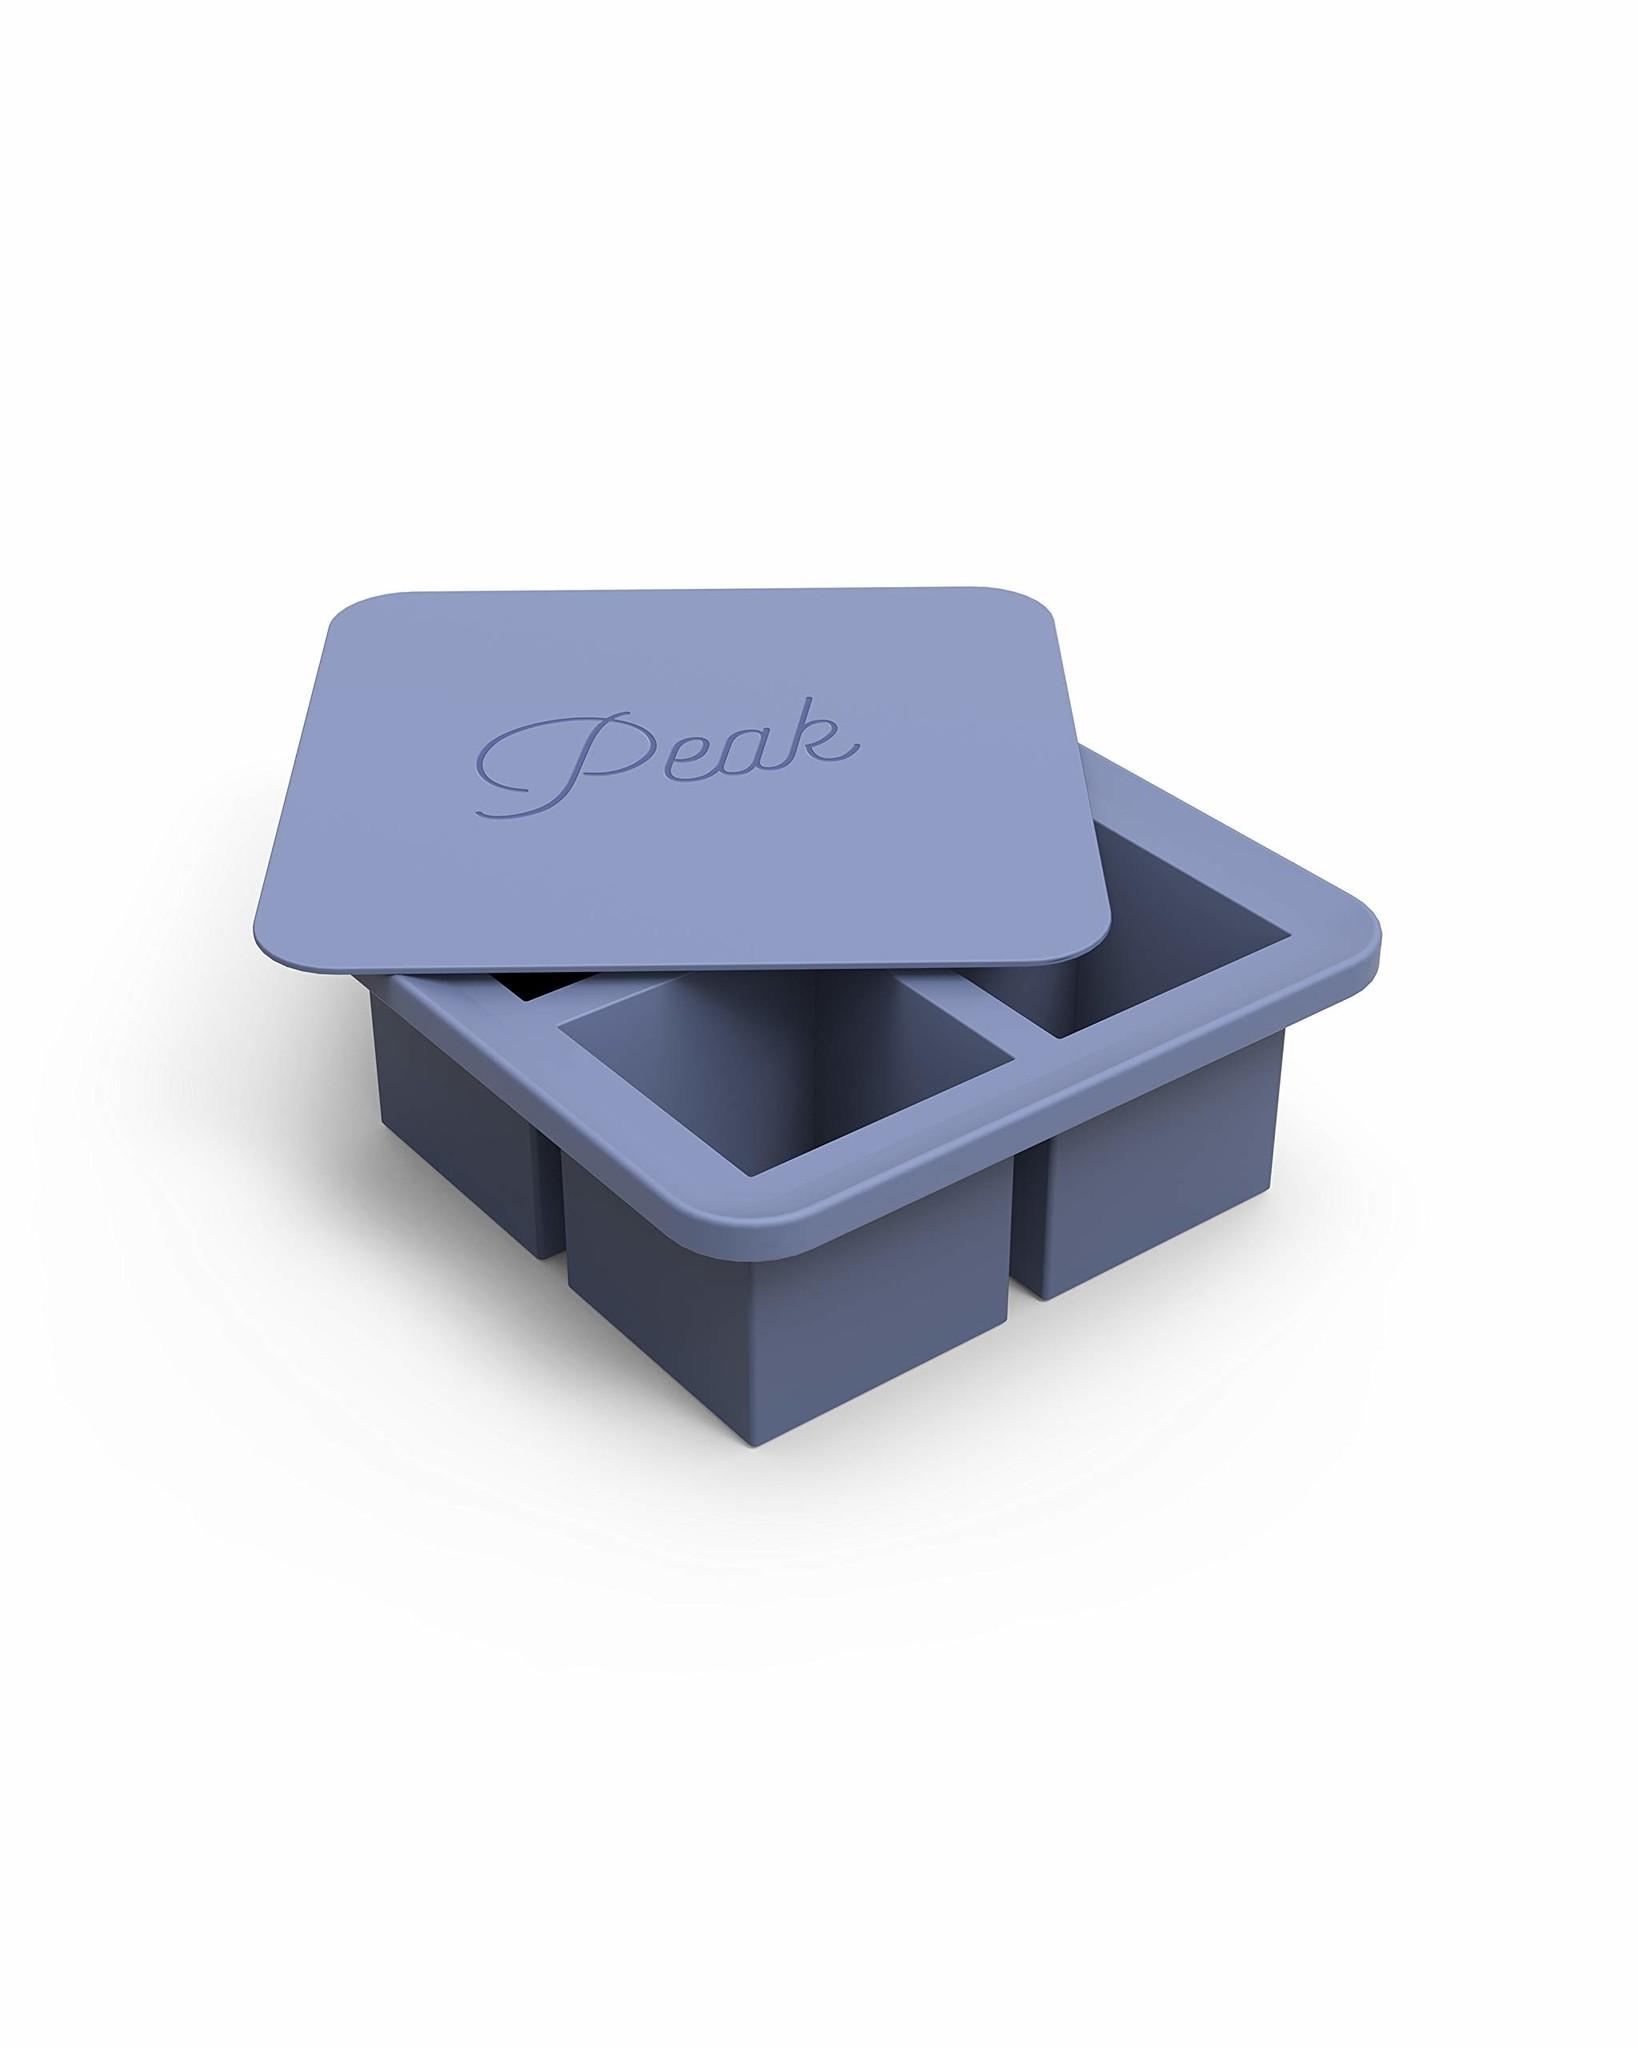 W&P Design XL Ice Cube Tray - Blue